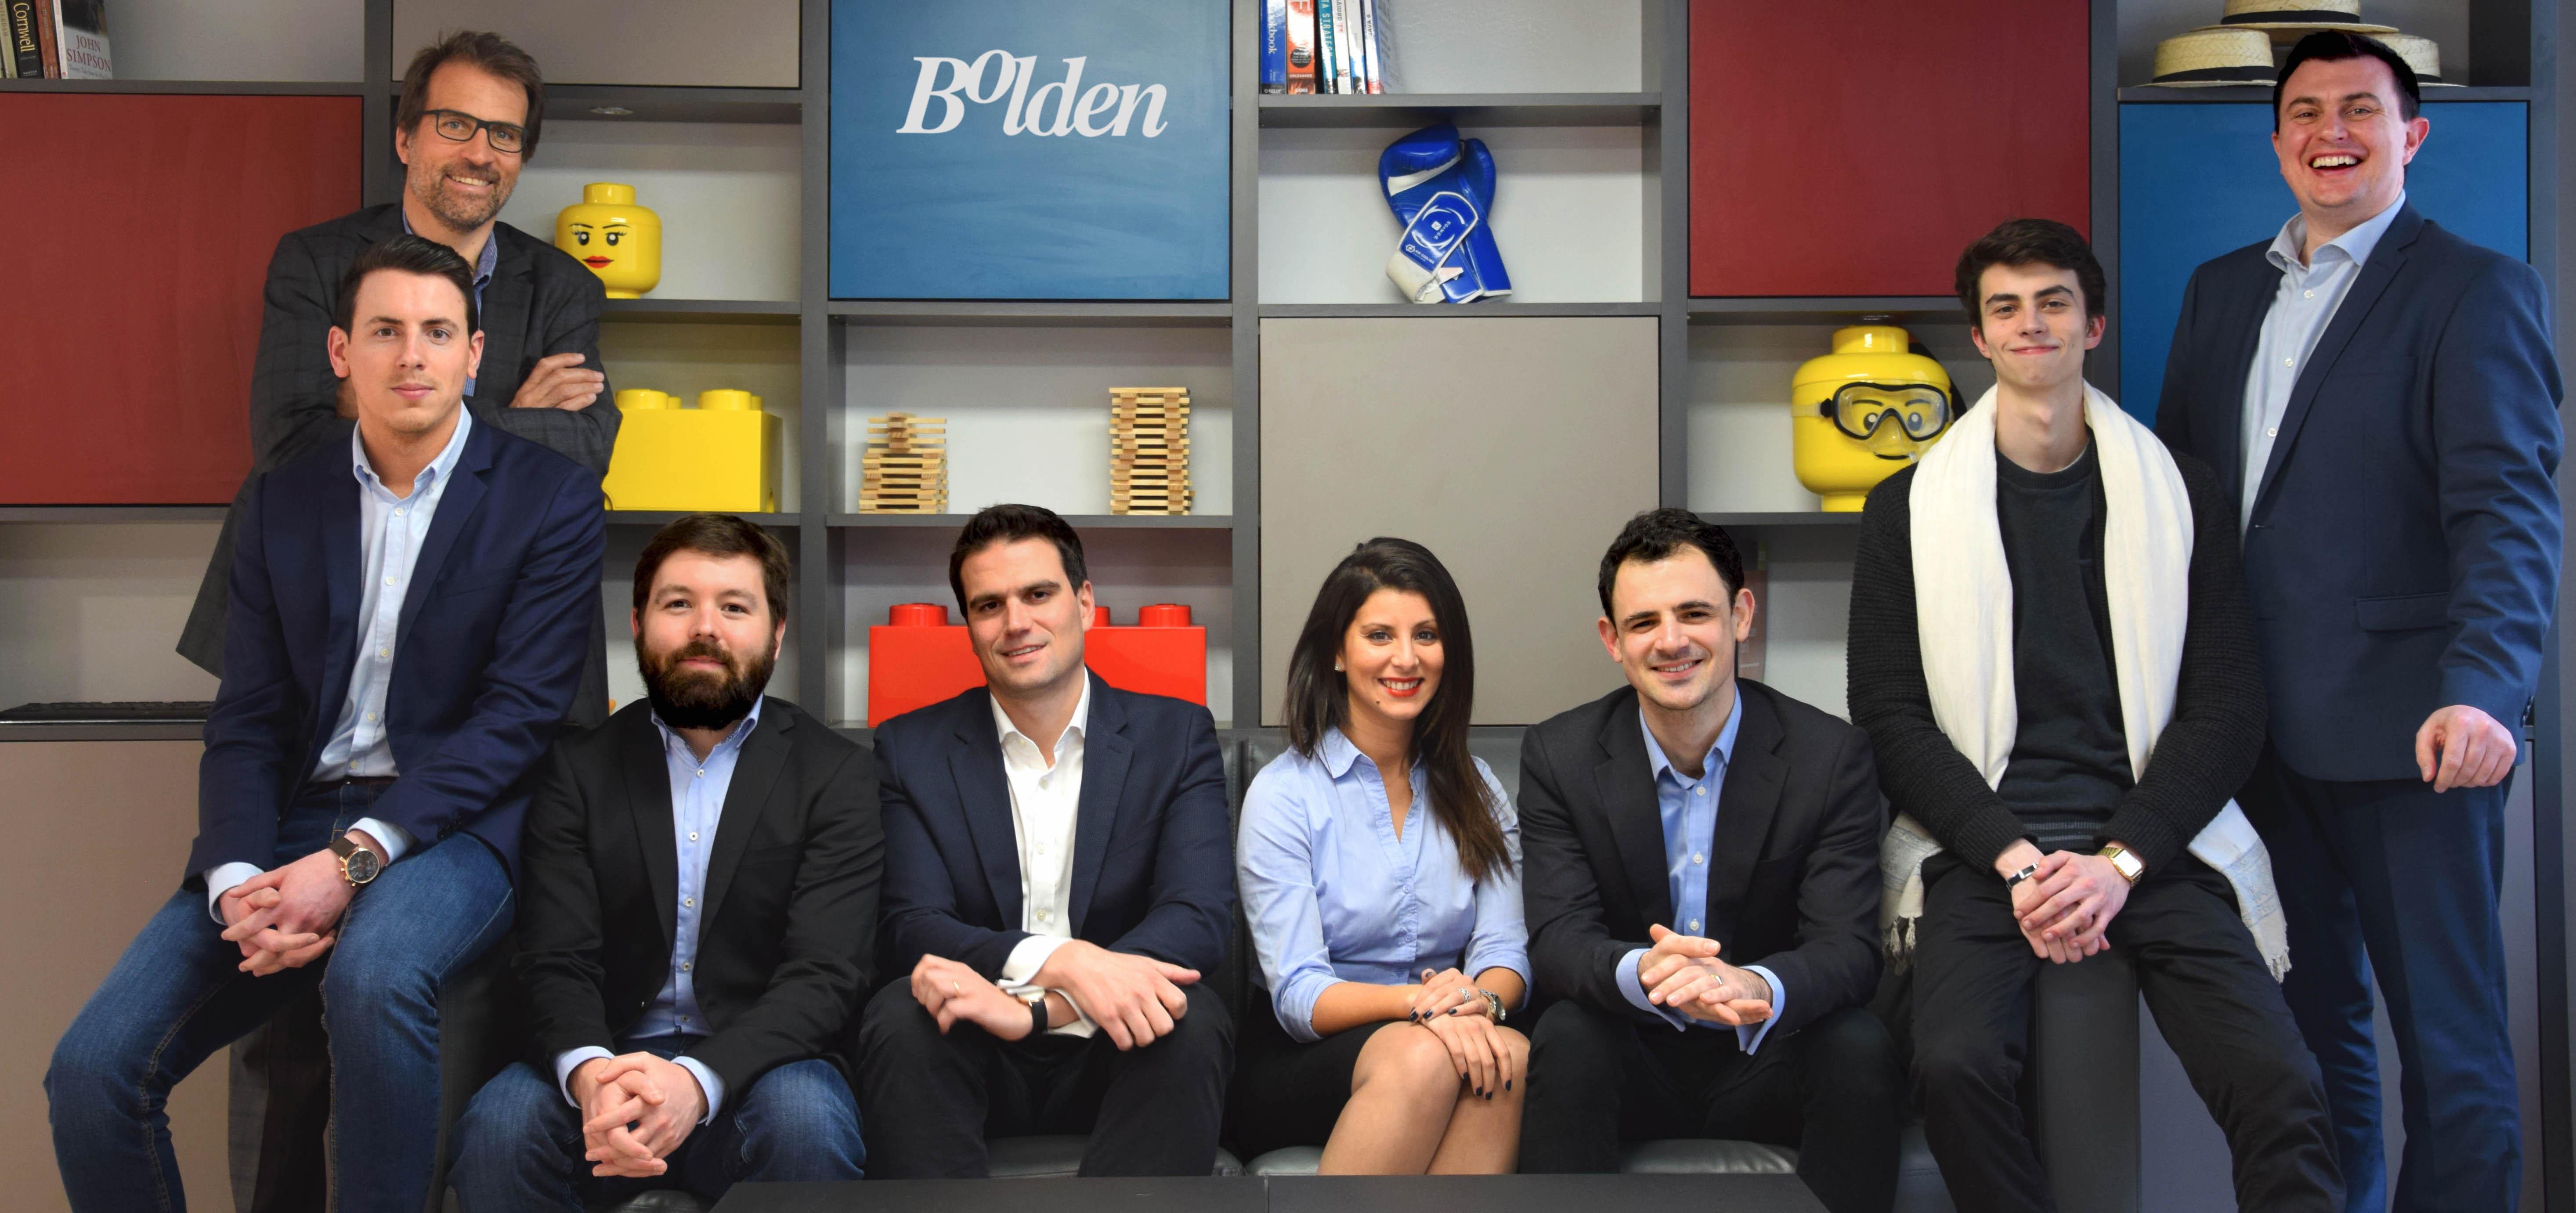 Bolden - equipe copie